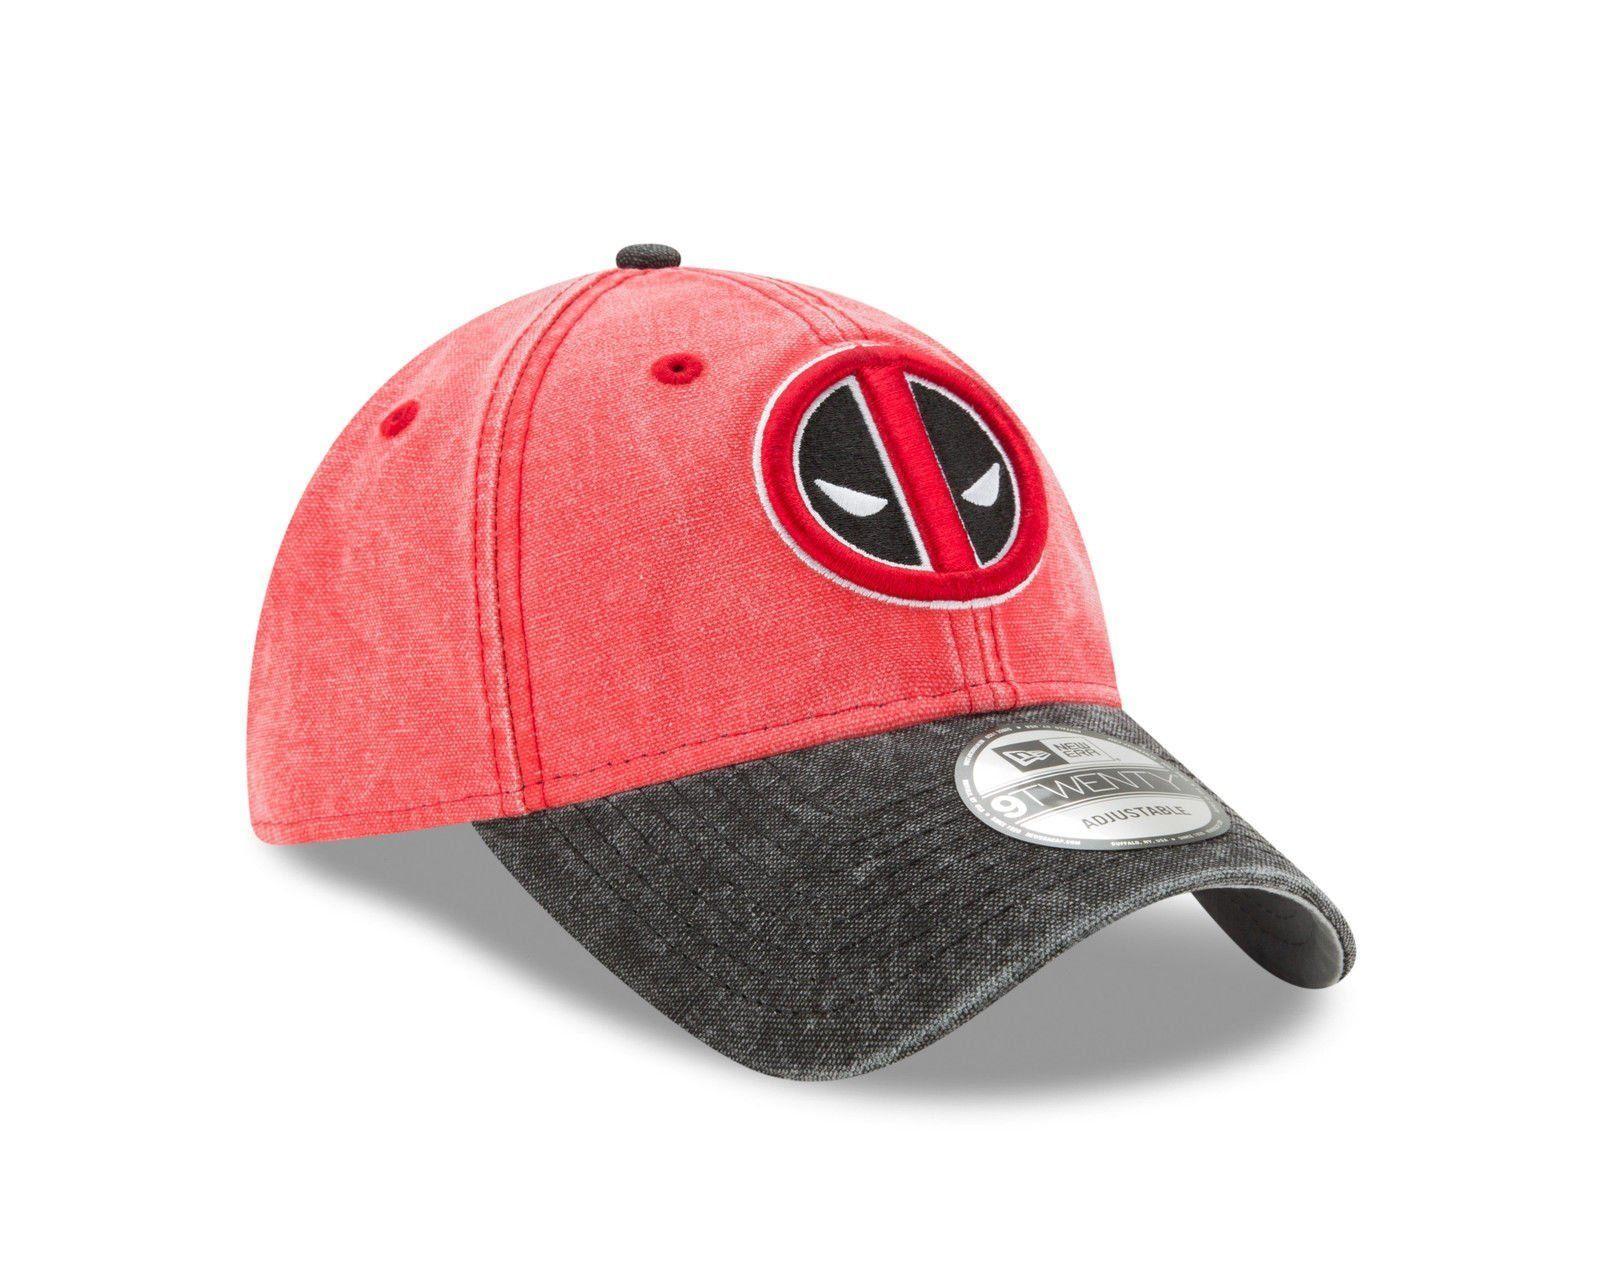 24e4e7ddd61 New Era Marvel Comics Deadpool 9TWENTY Rugged Canvas Strapback Hat (Size   One Size